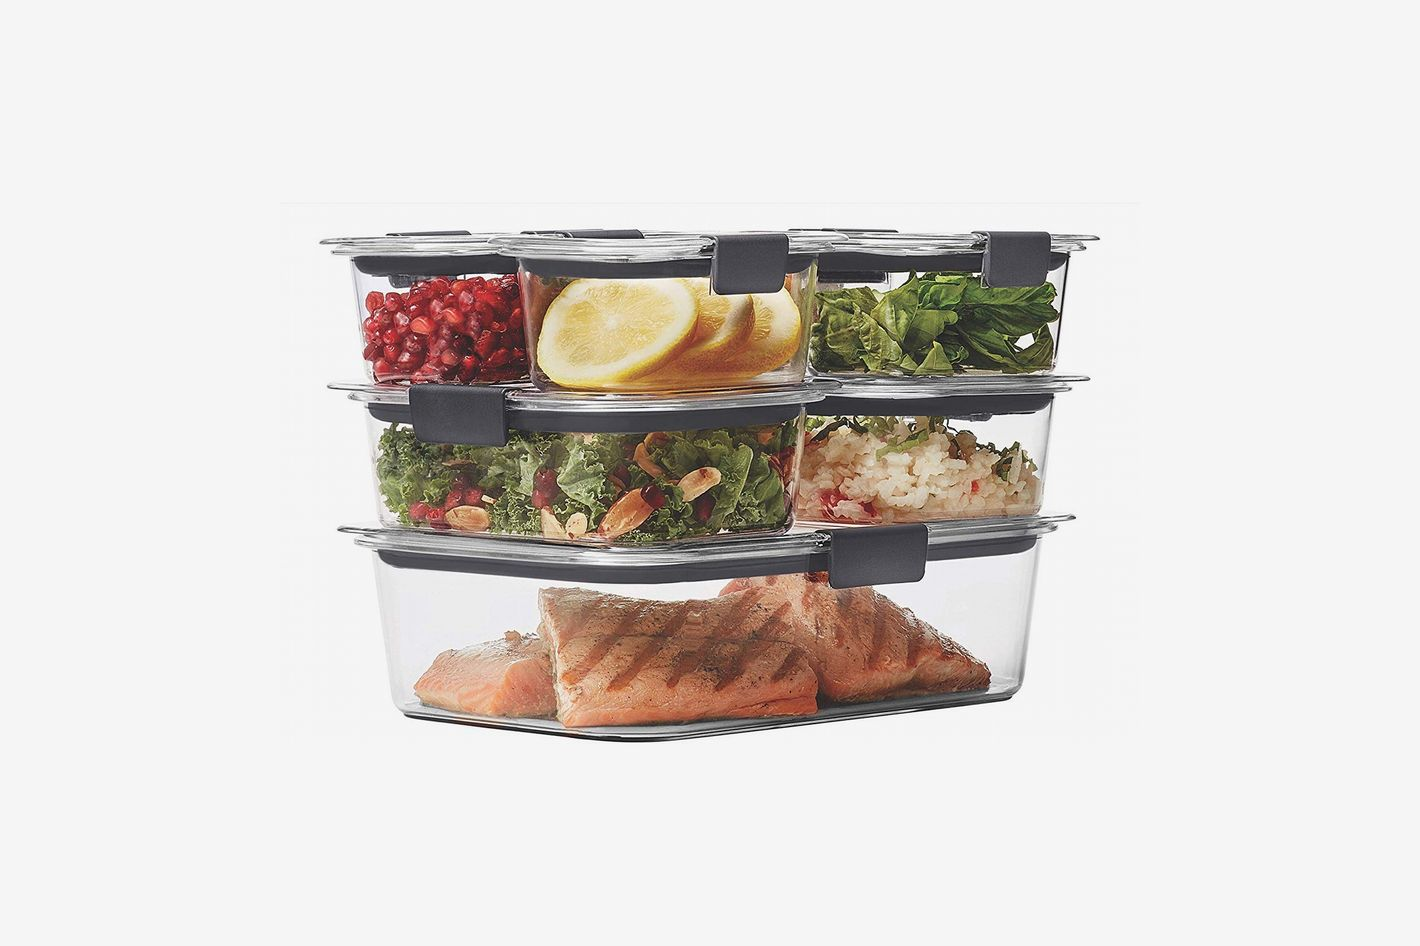 Rubbermaid Brilliance Food-Storage Container, 14-Piece Set